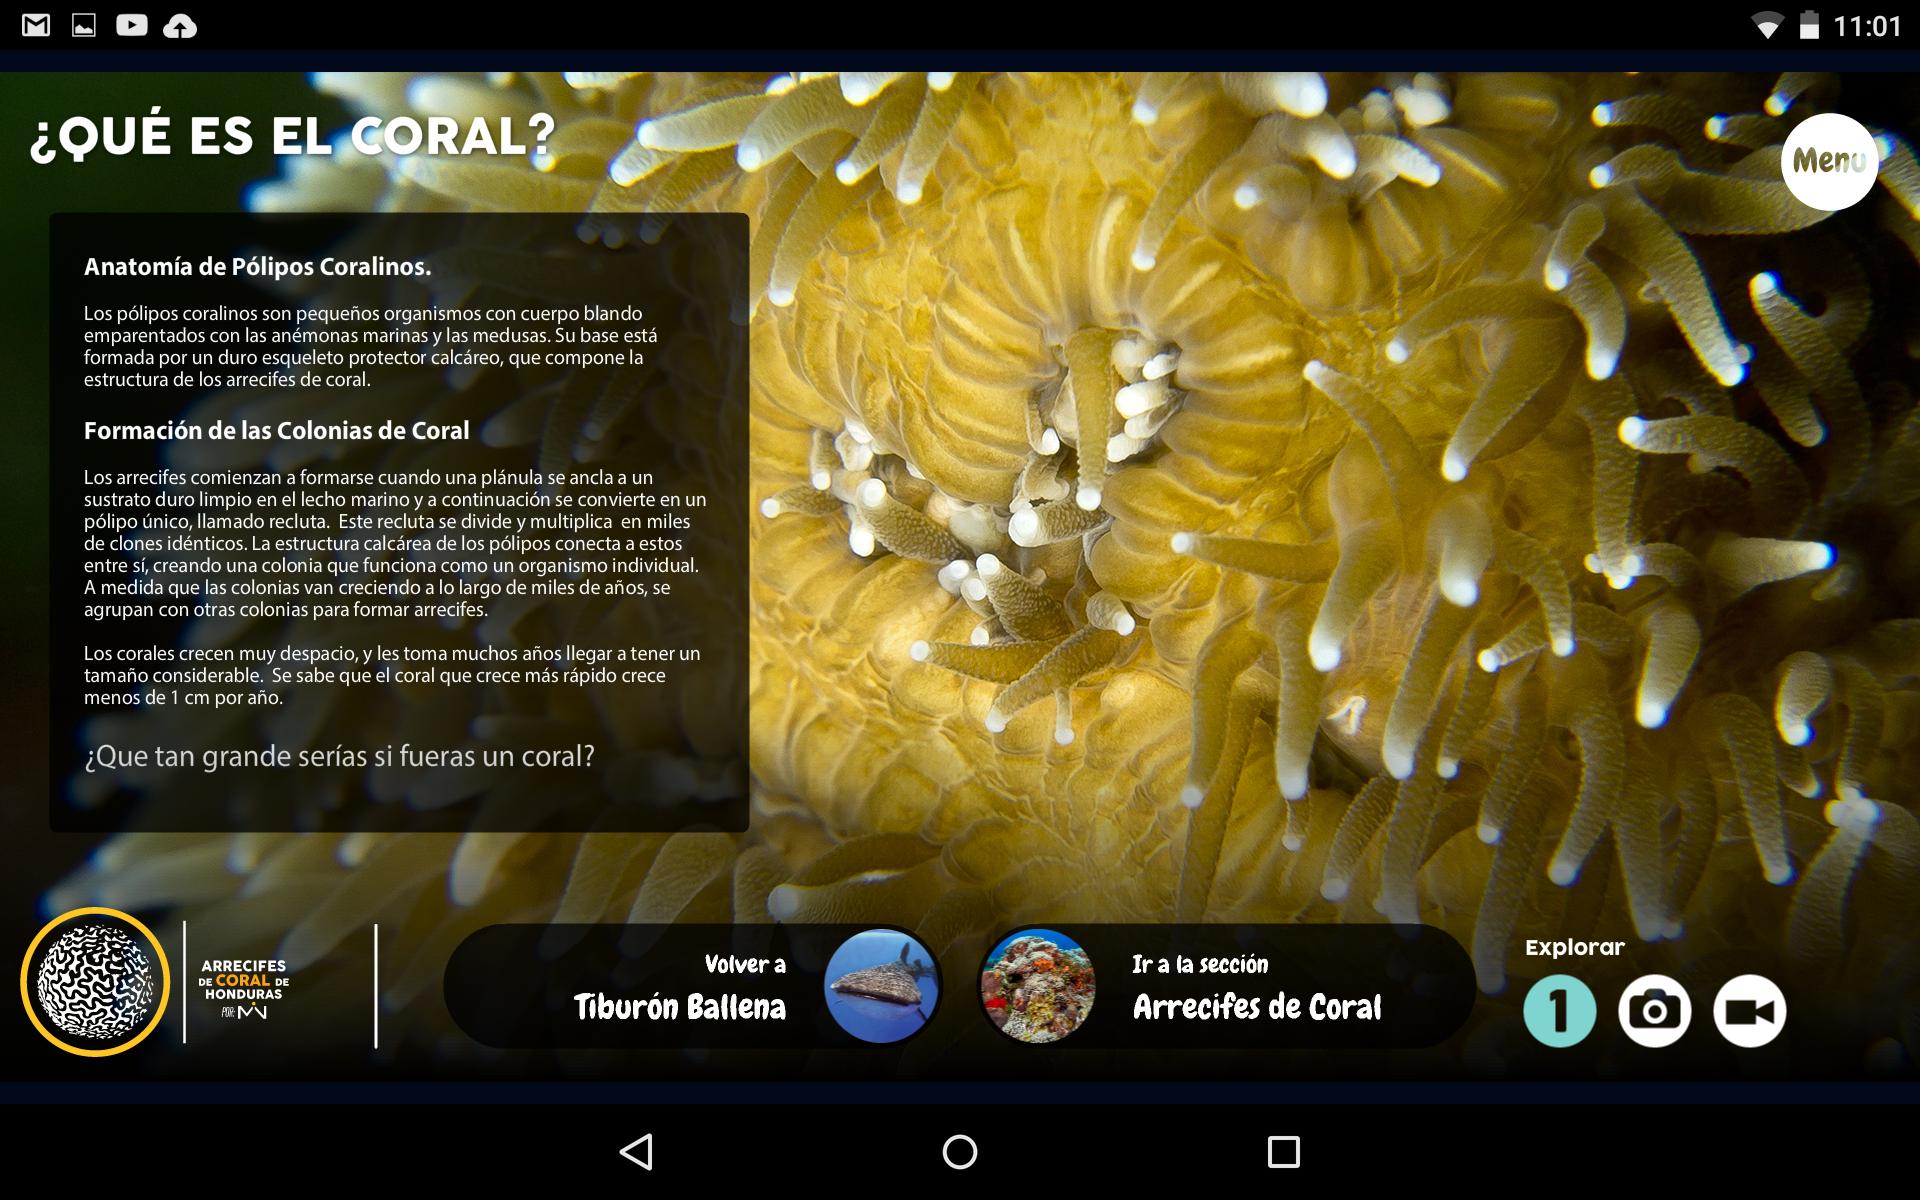 Arrecifes de Coral para Android on Behance